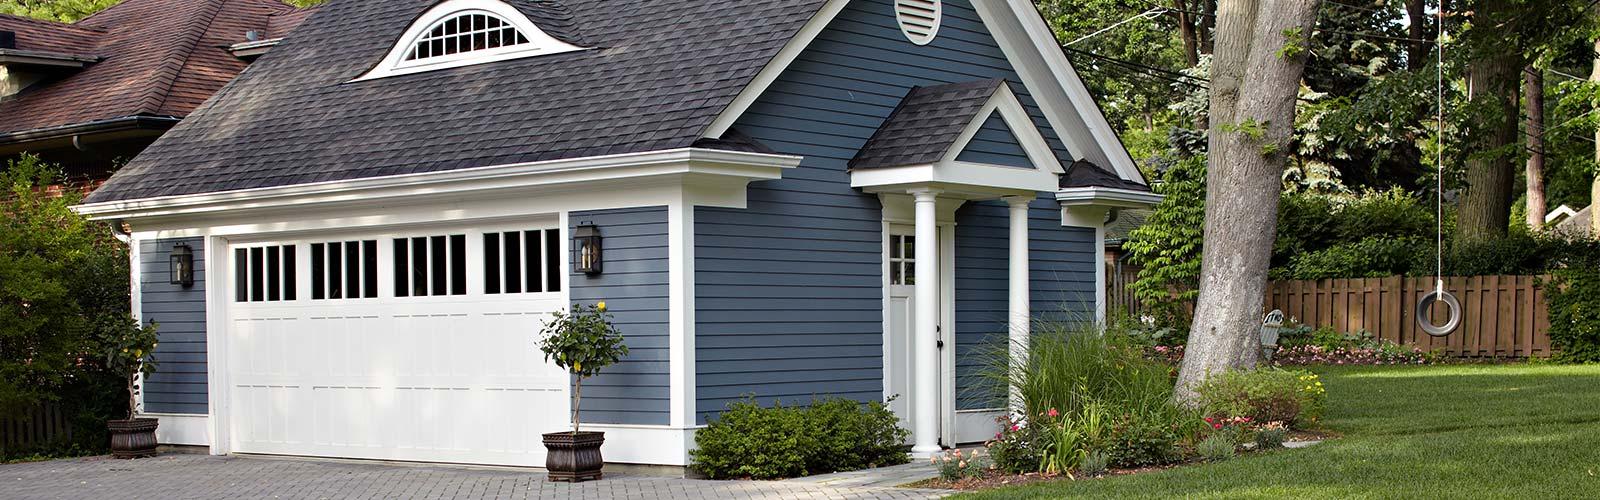 Top garage door companies near you our service is 100 free rubansaba